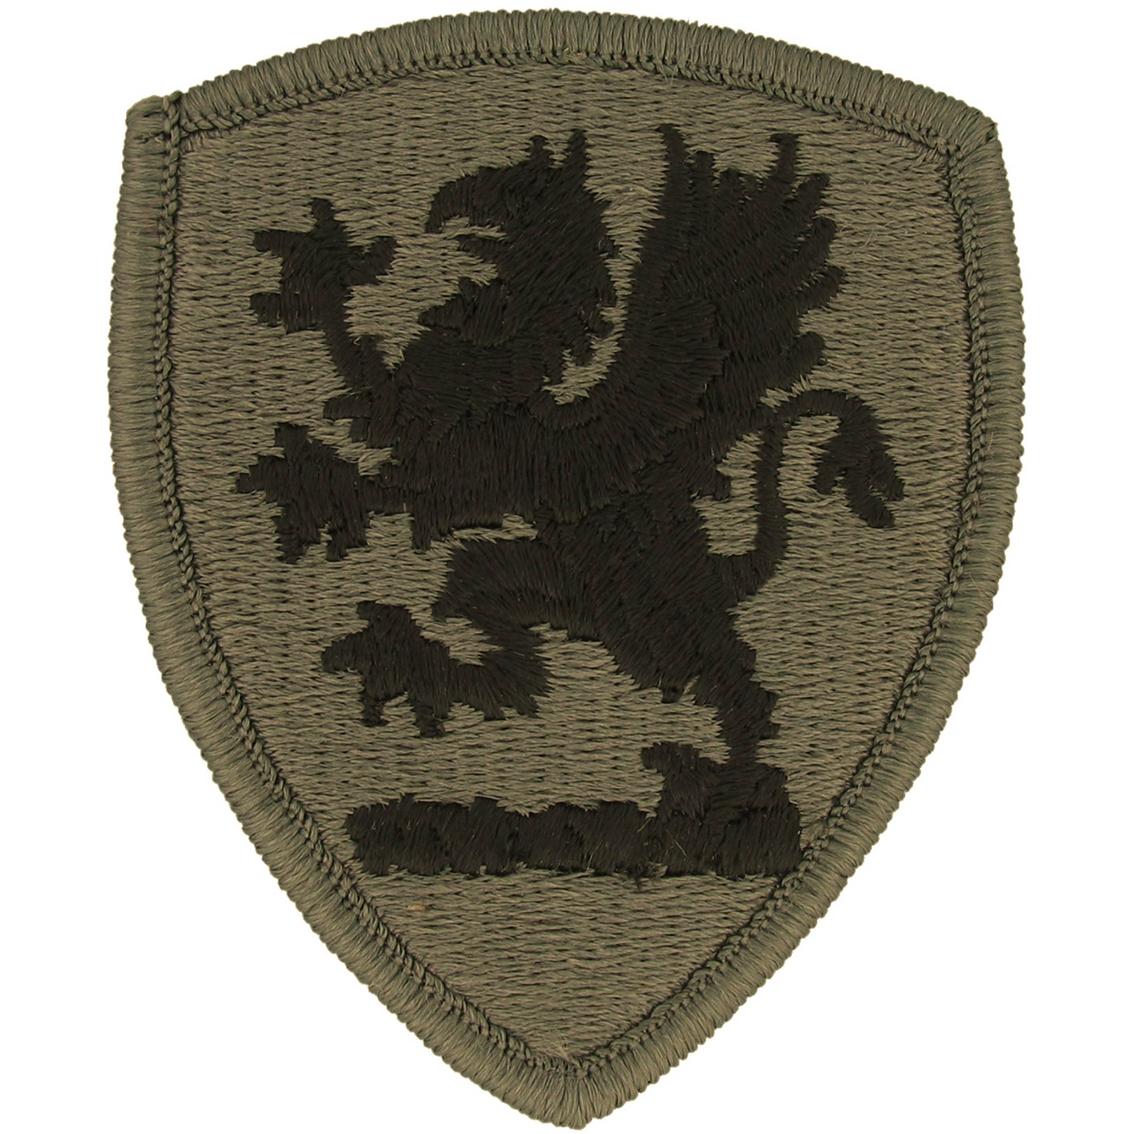 Army Unit Patch Michigan State National Guard Ocp H